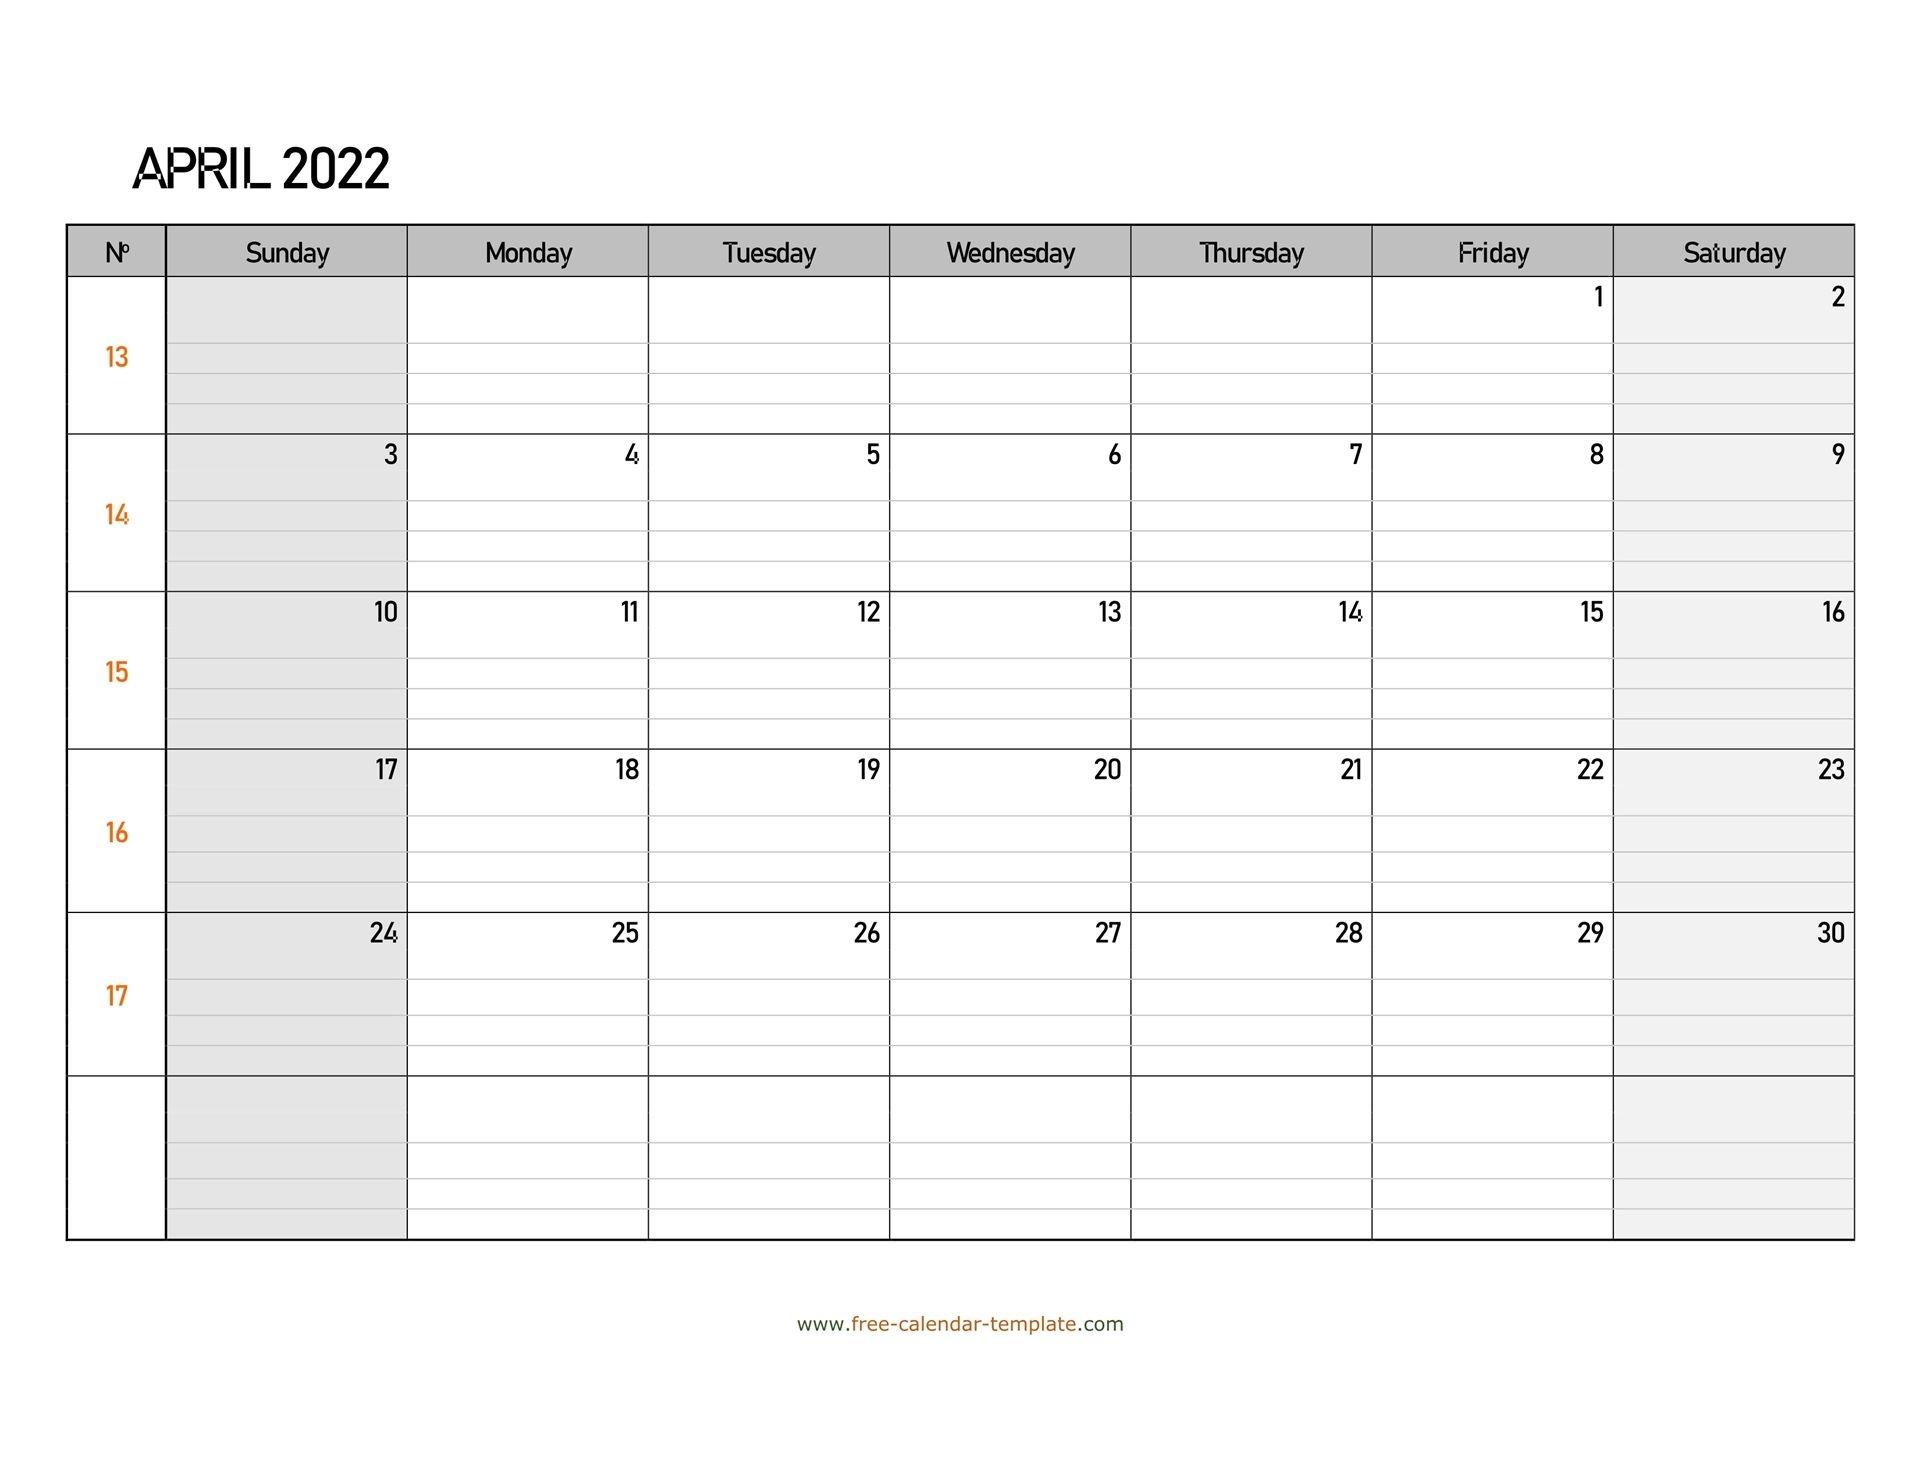 April 2022 Calendar Free Printable With Grid Lines